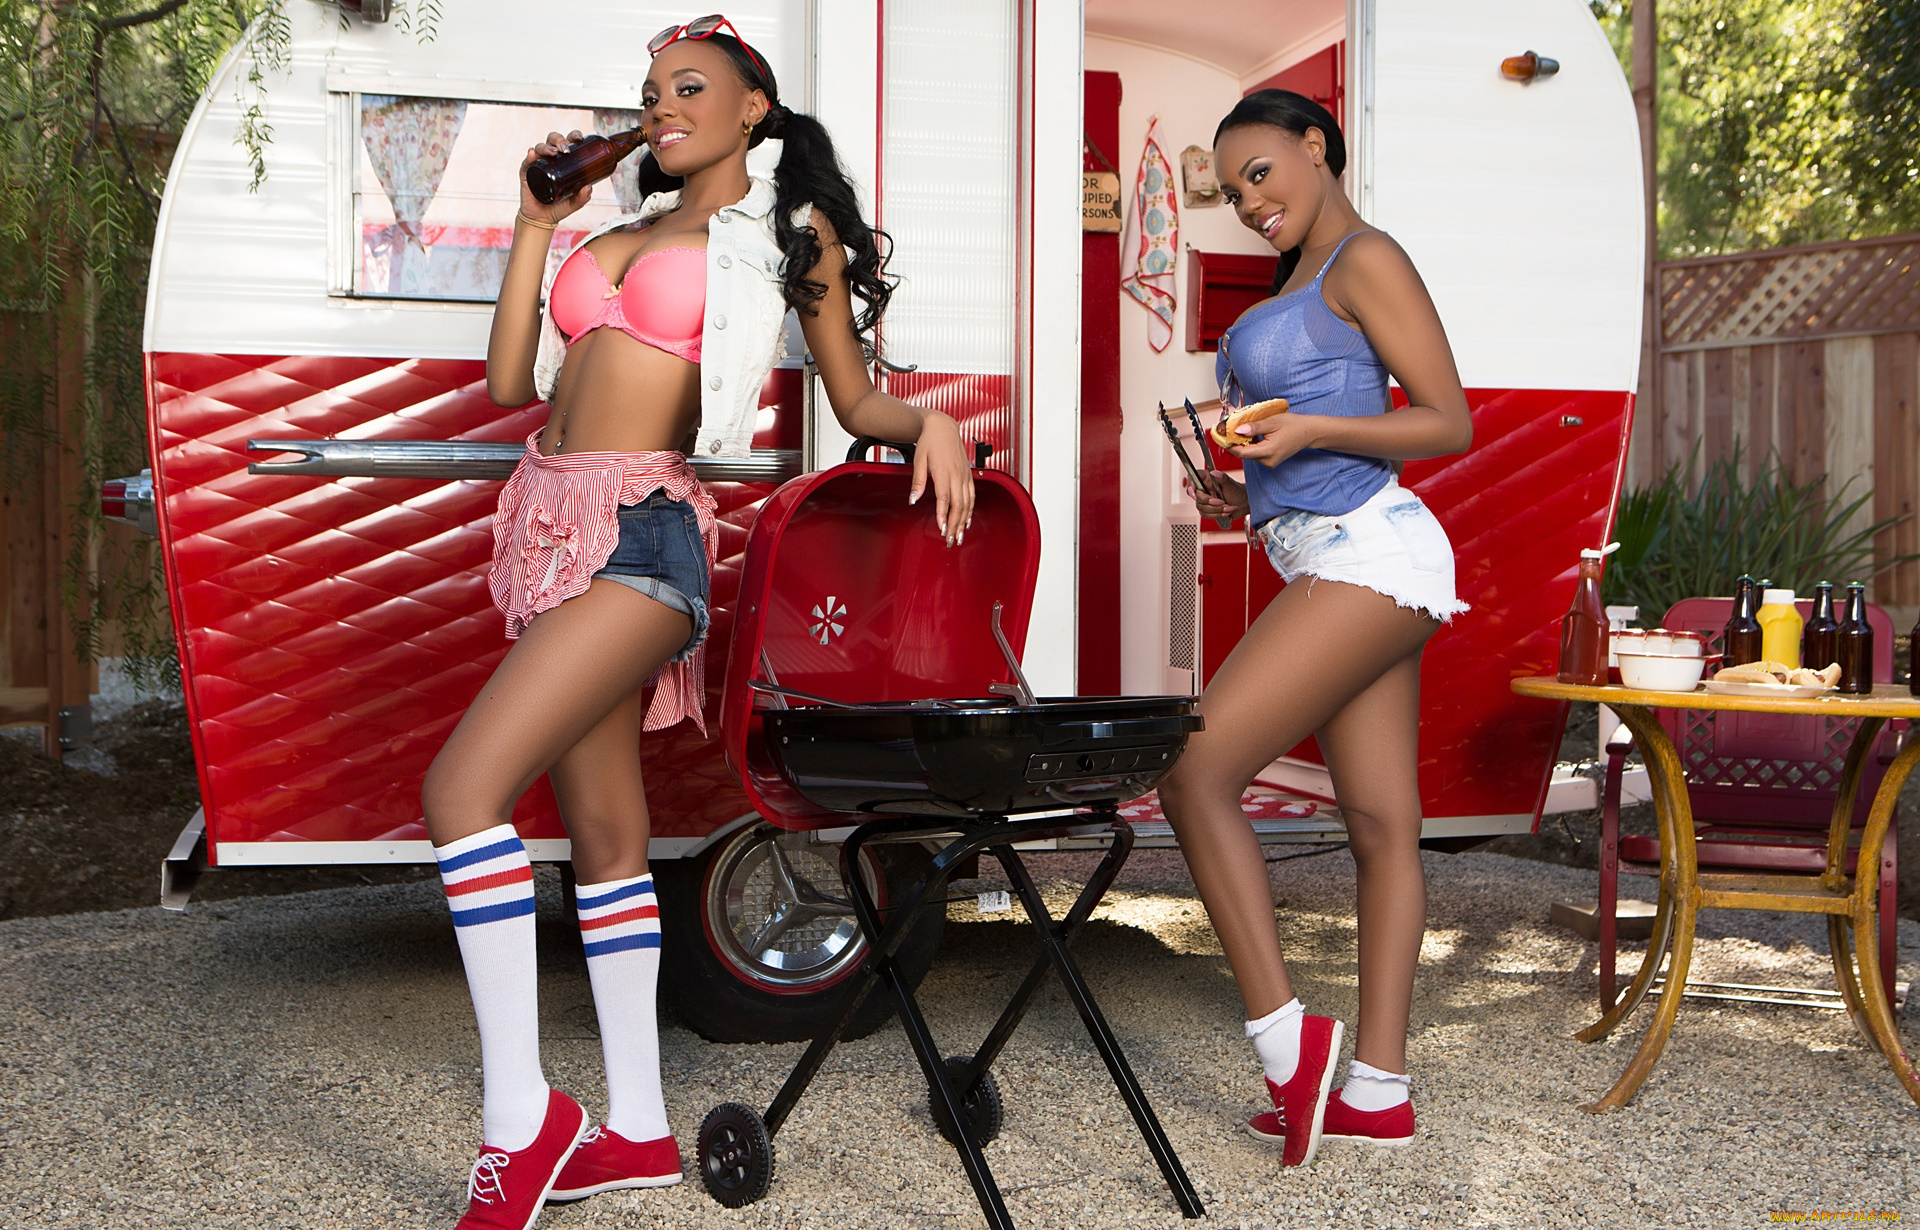 Ebony centerfold models Brittany and Brandi Kelly wash car naked  723496